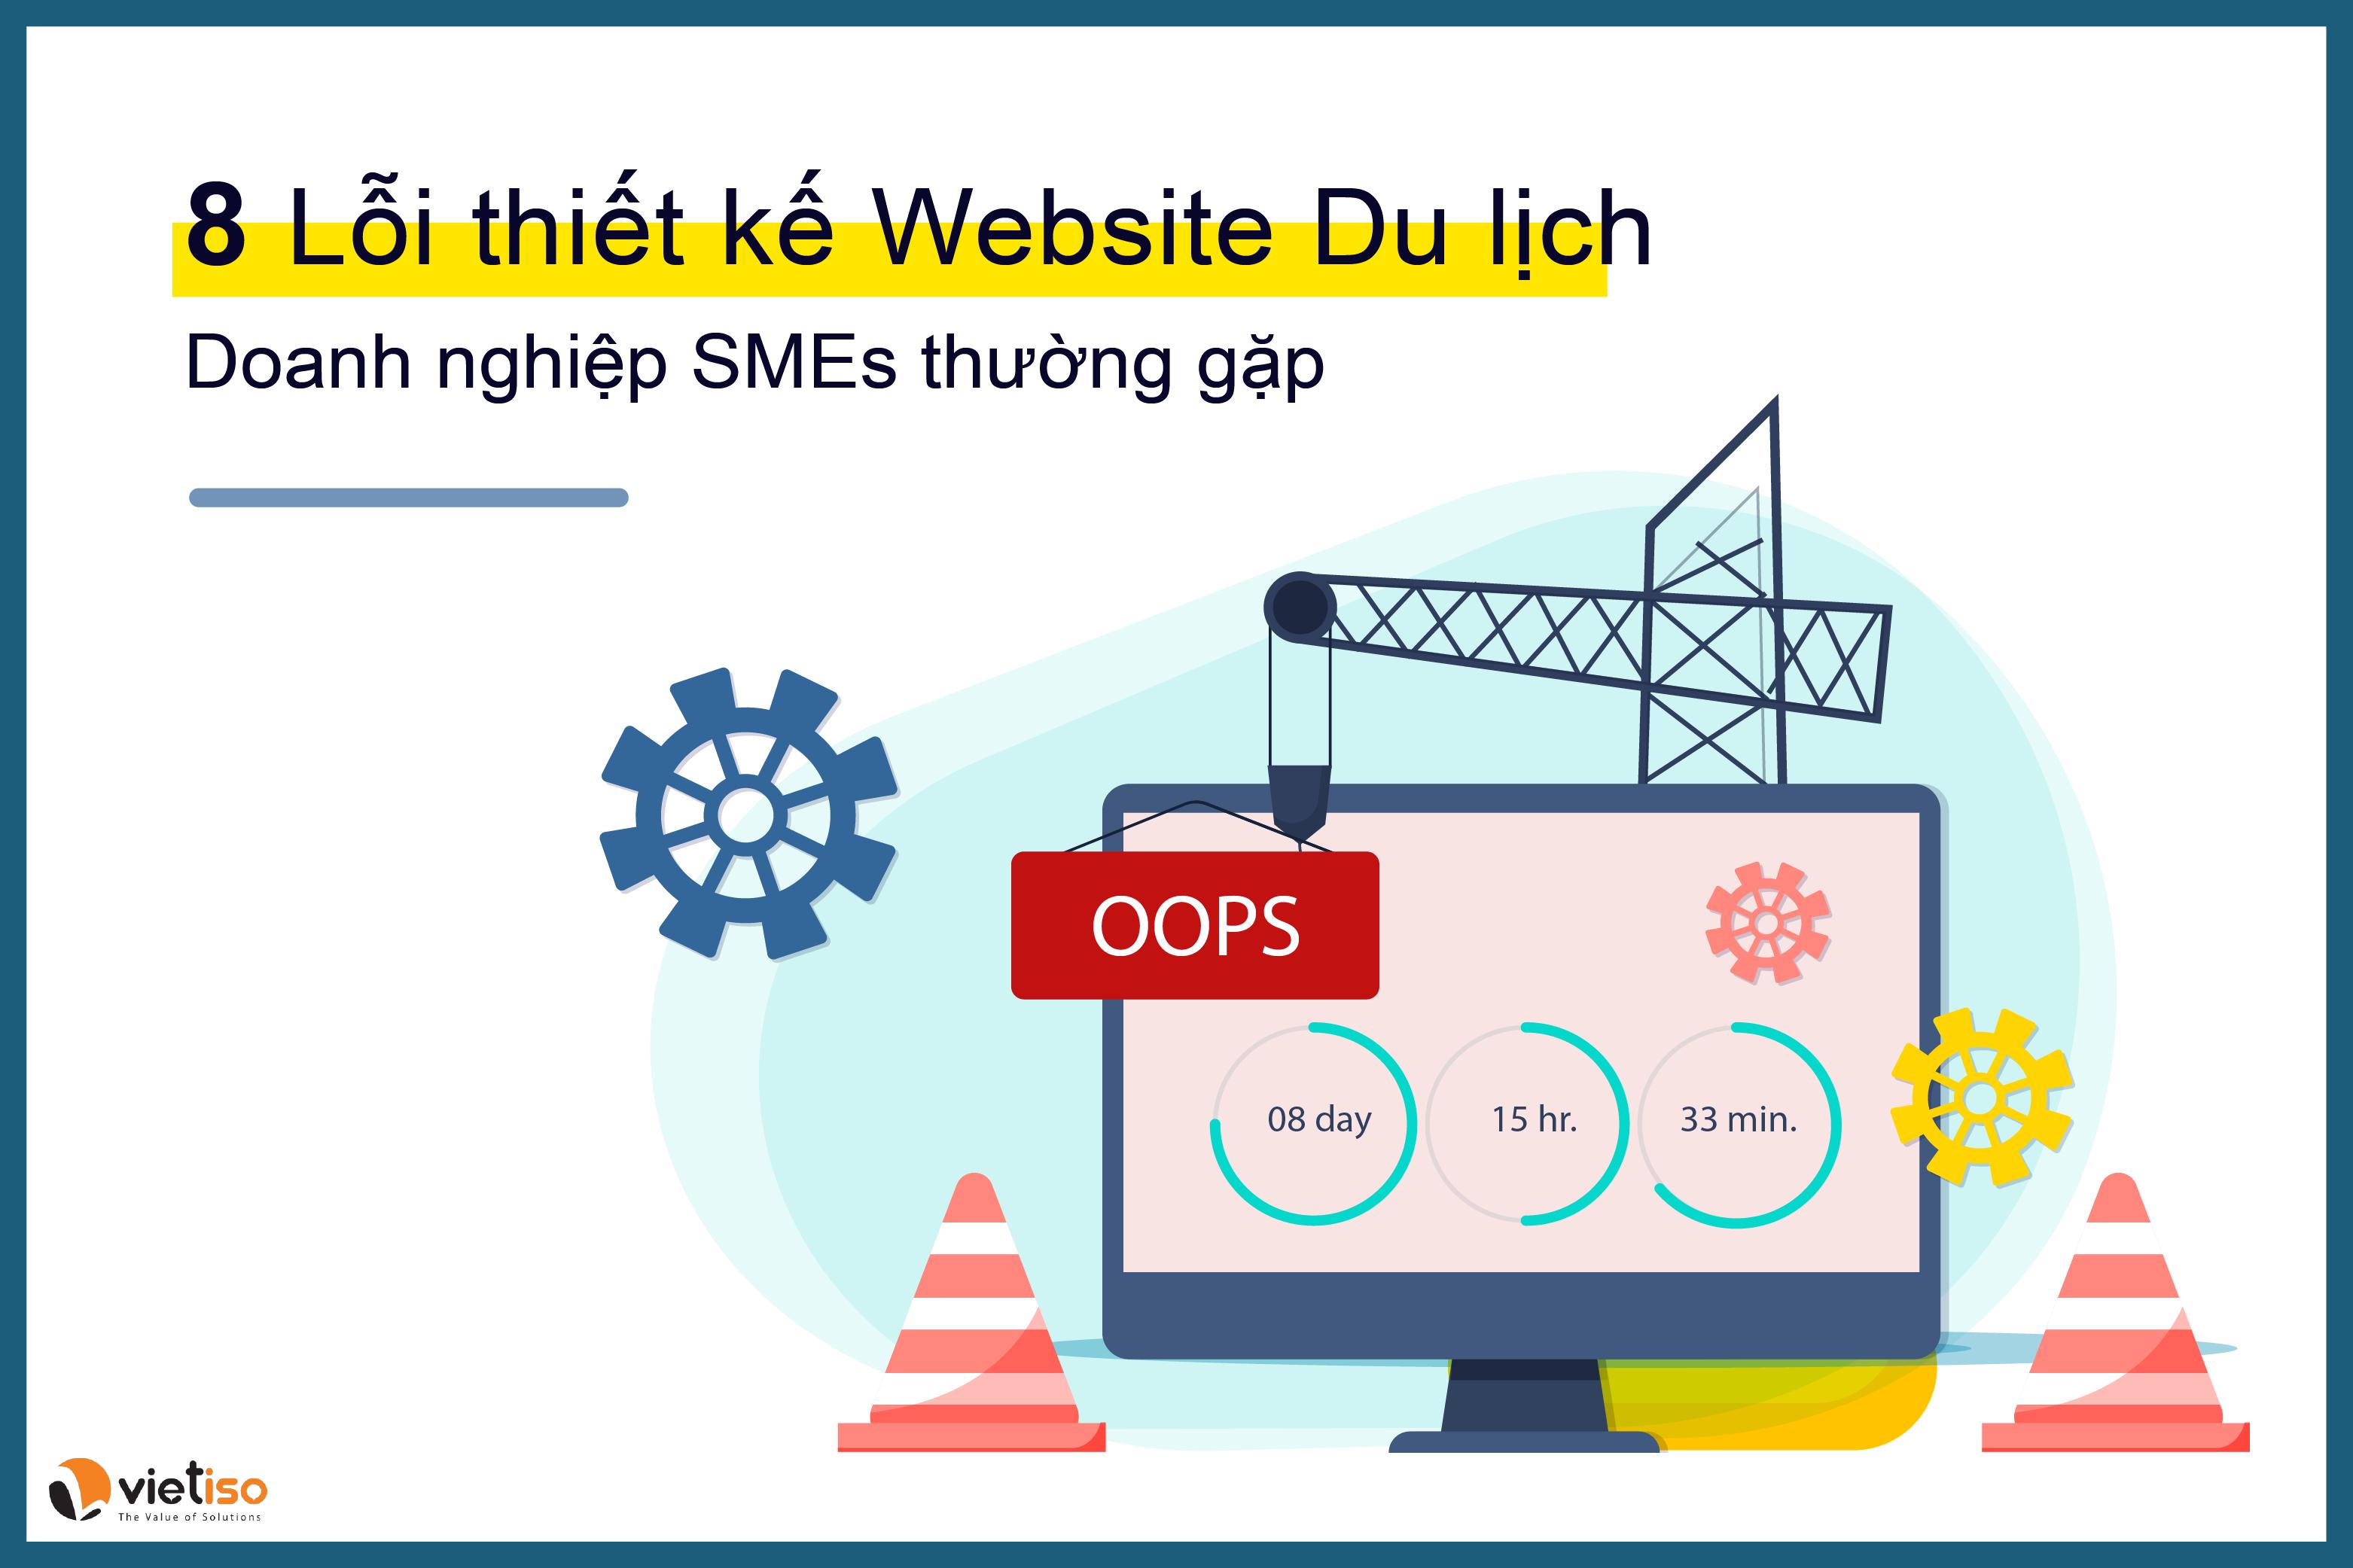 thiet-ke-website-du-lich-dep-vietiso